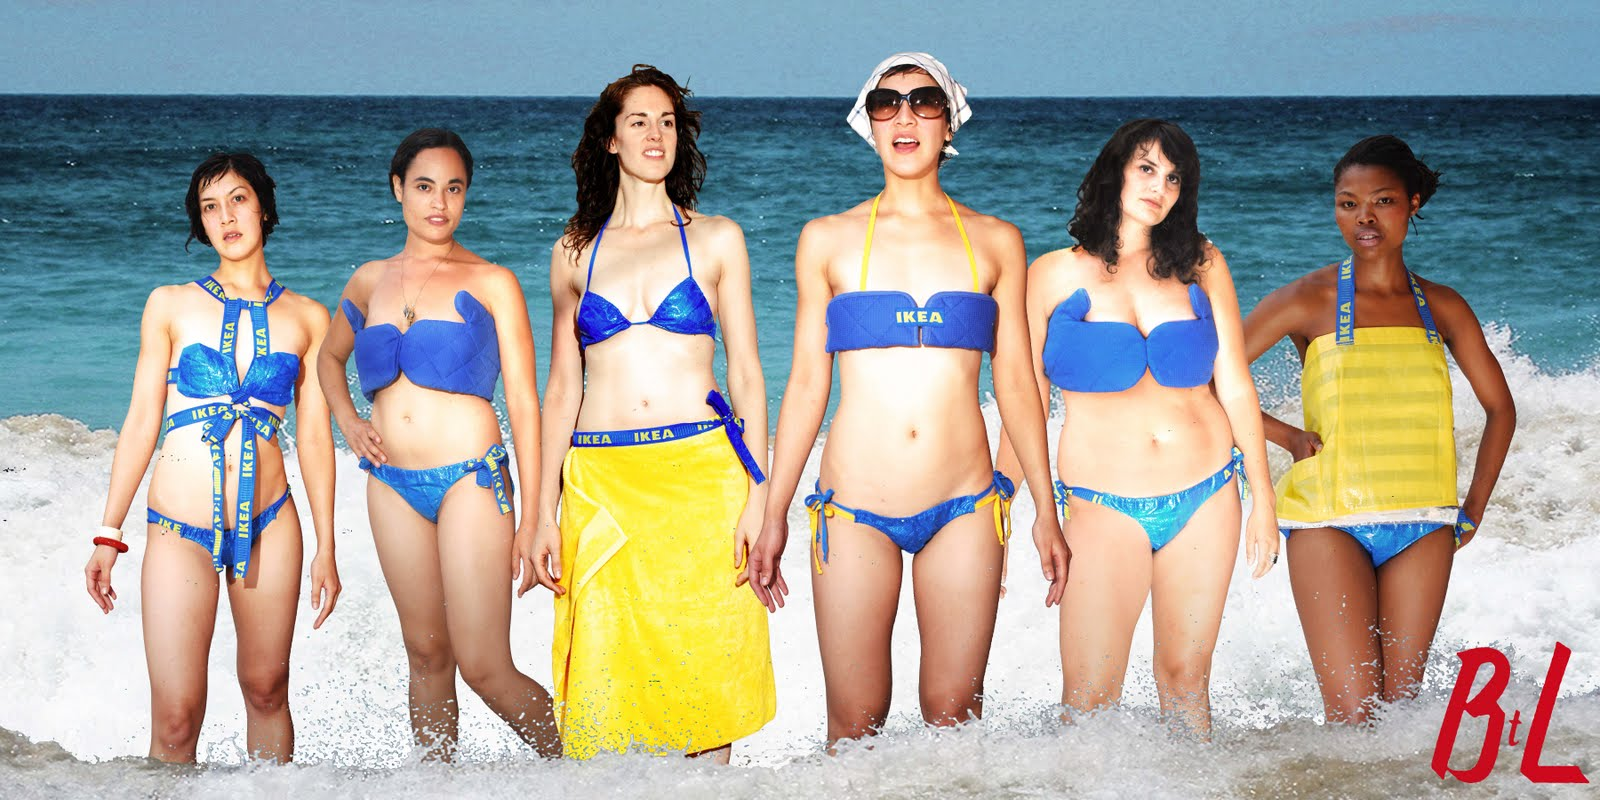 Ikea bikini + summer clothing line! - IKEA Hackers - IKEA Hackers